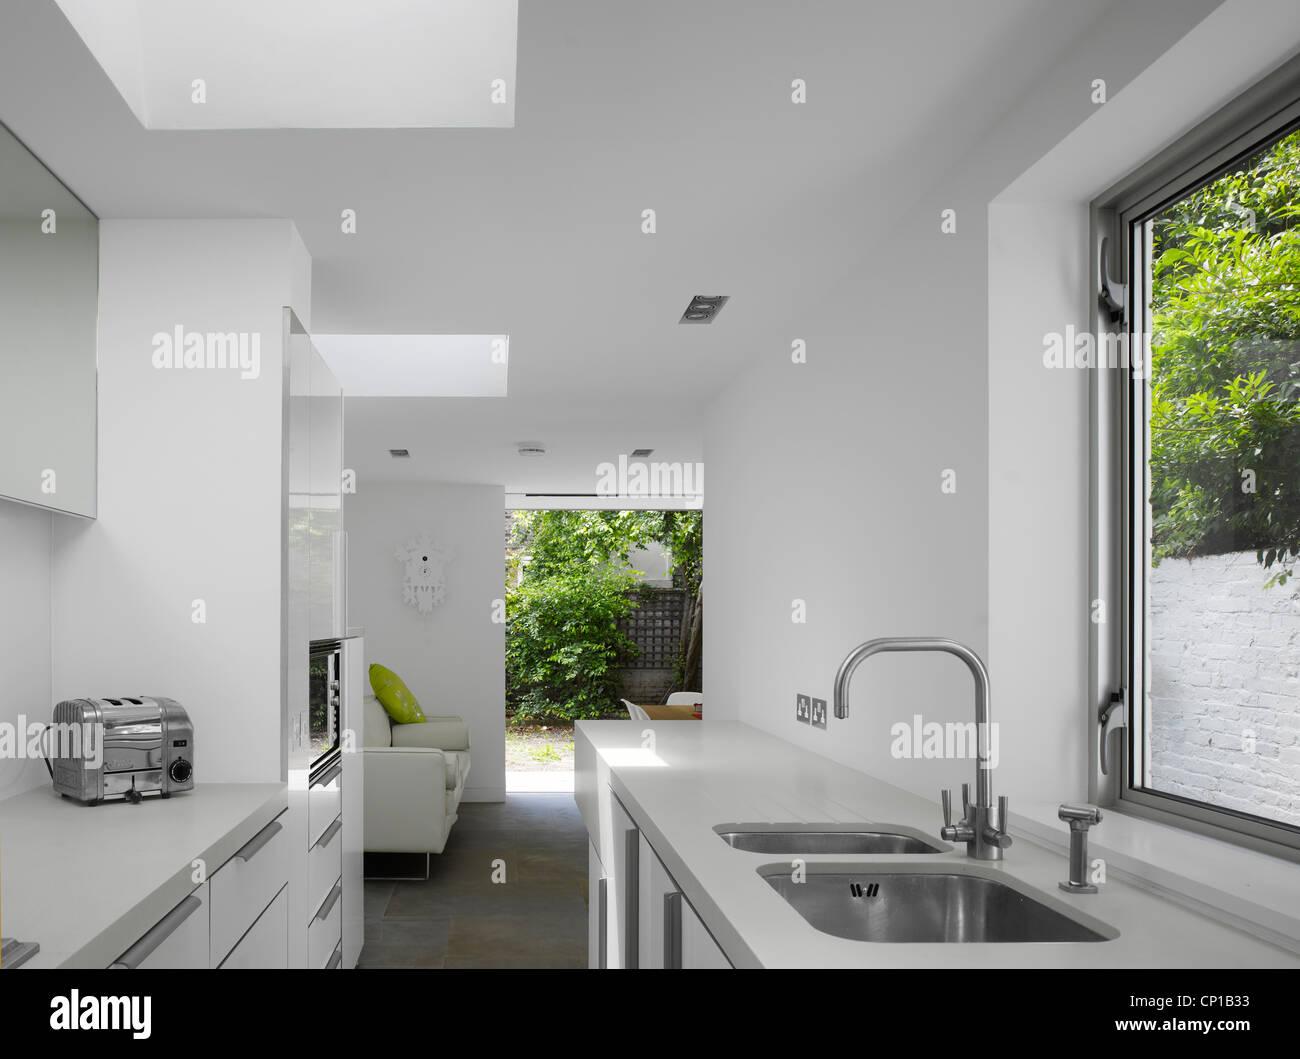 Kitchen Extension By Paul Archer Design London Uk Stock Photo